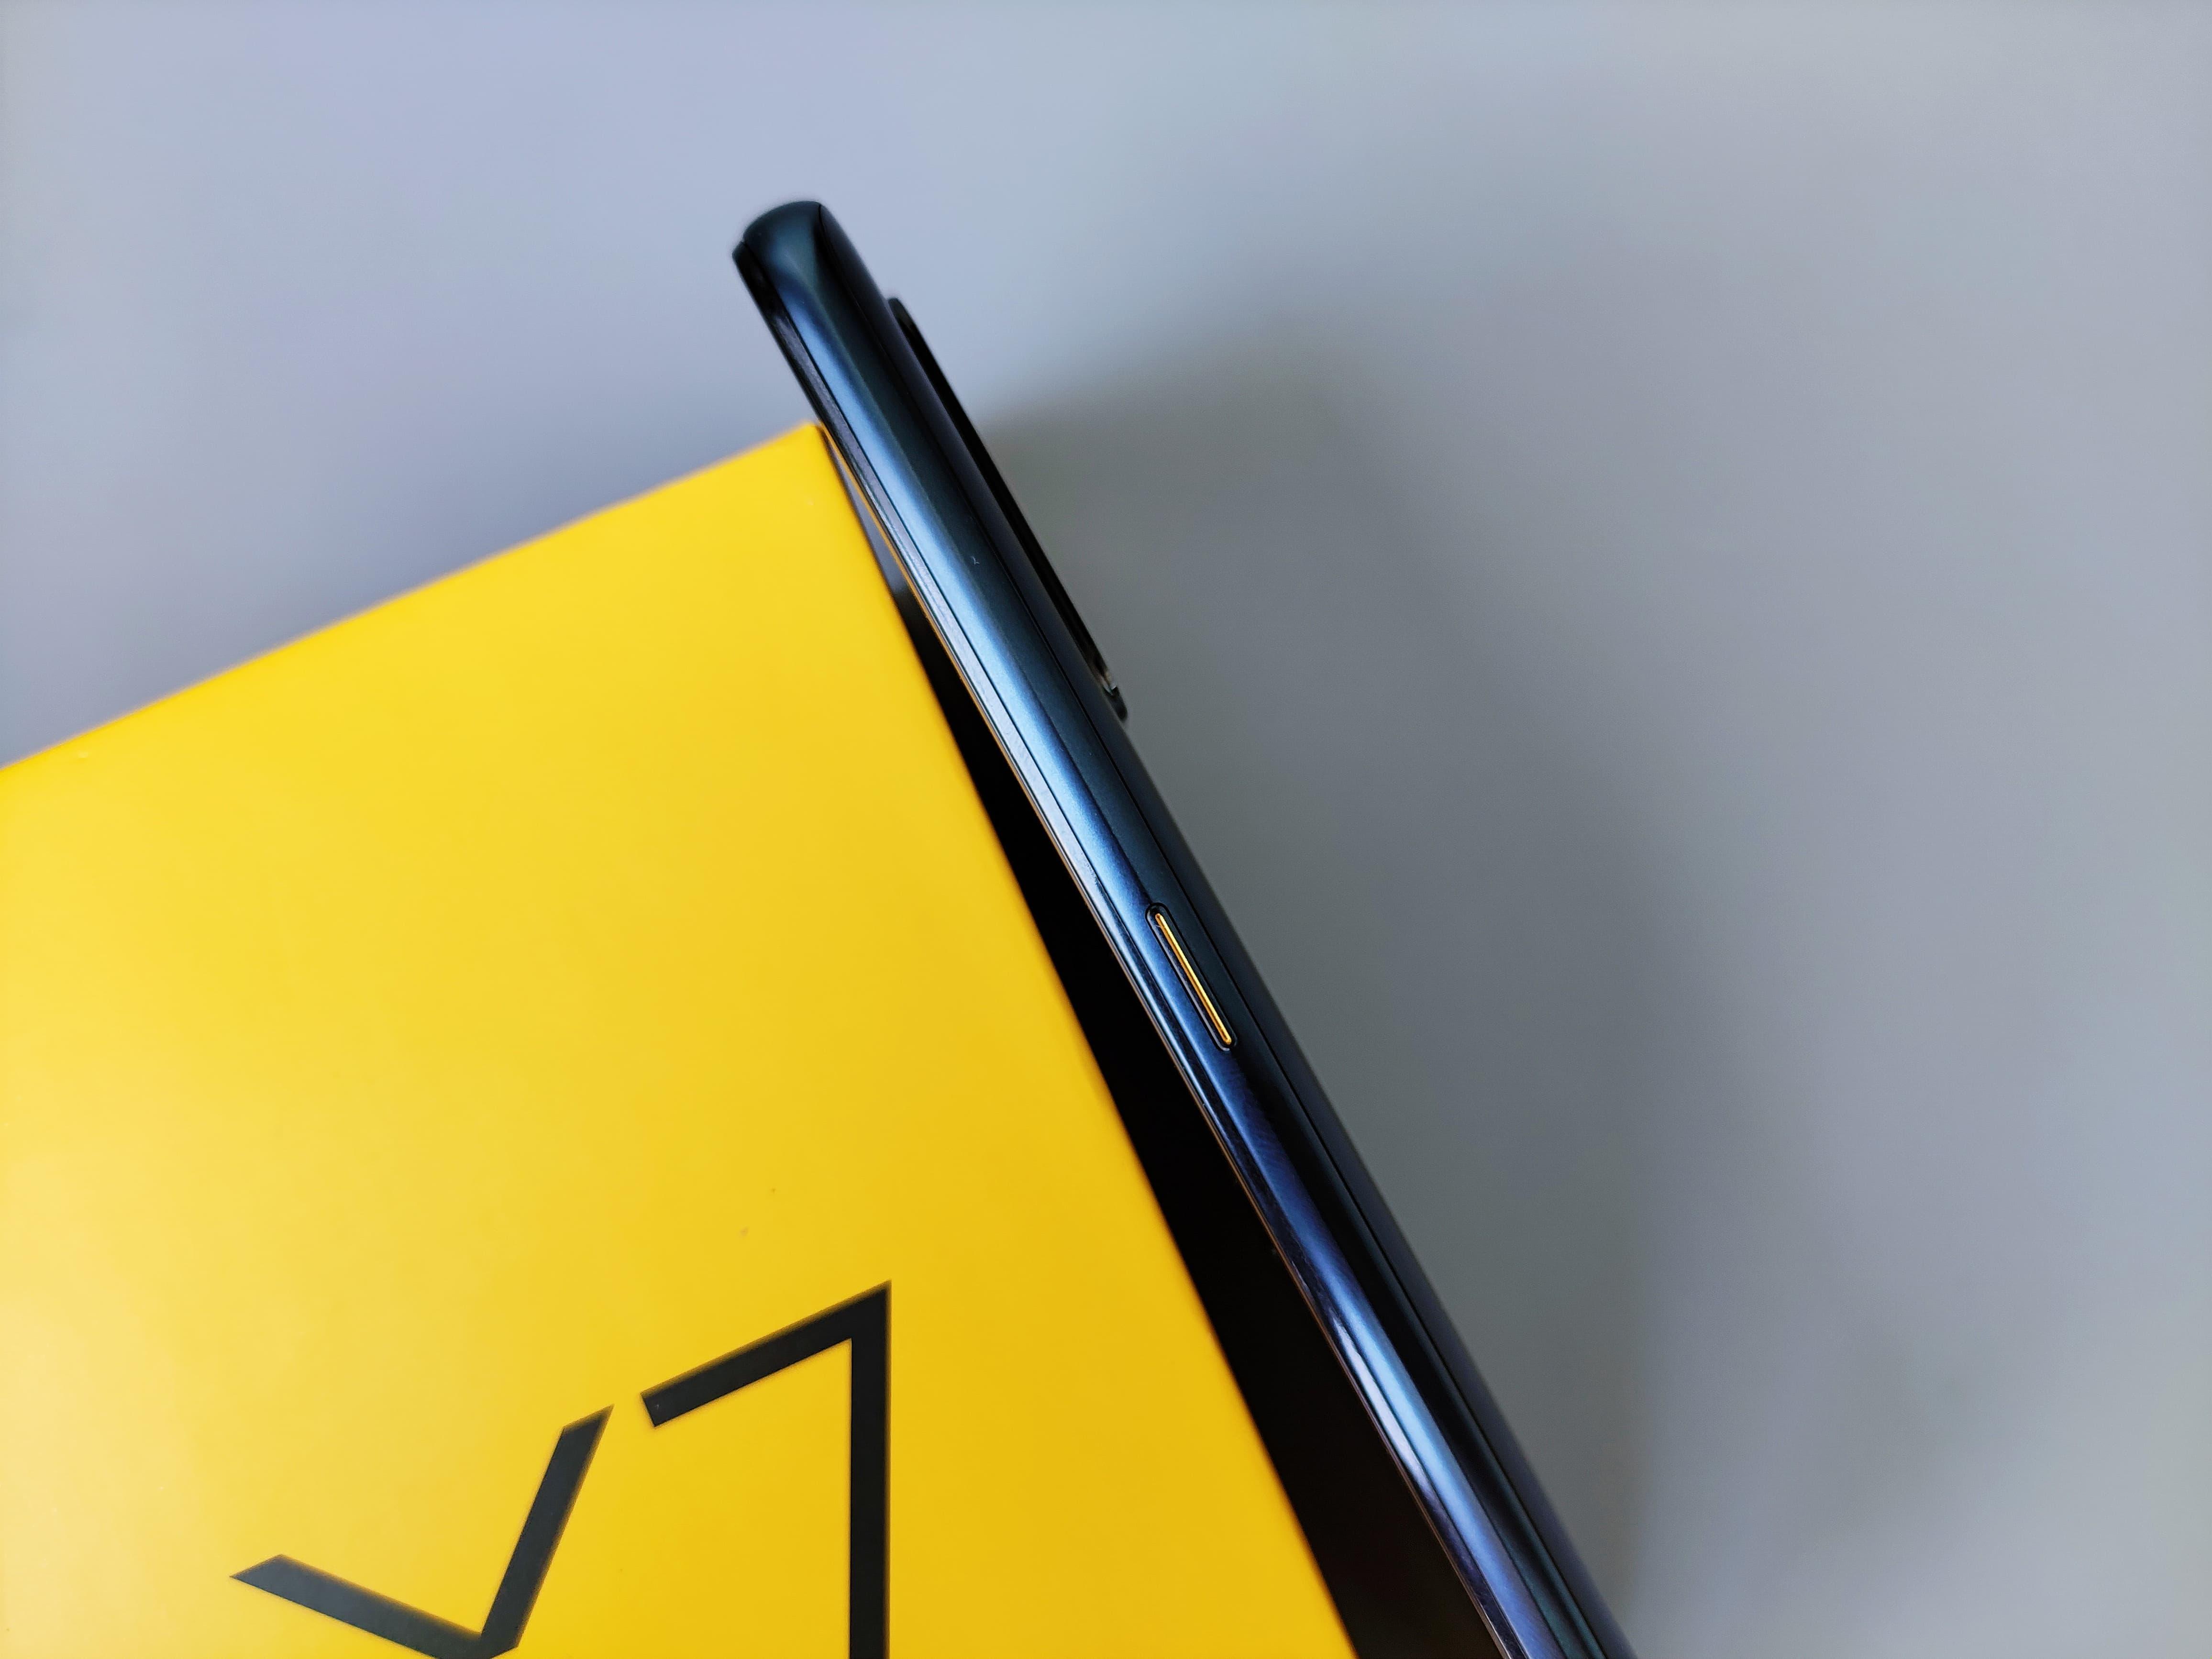 realme X7 Pro评测:轻薄、强悍、性价比